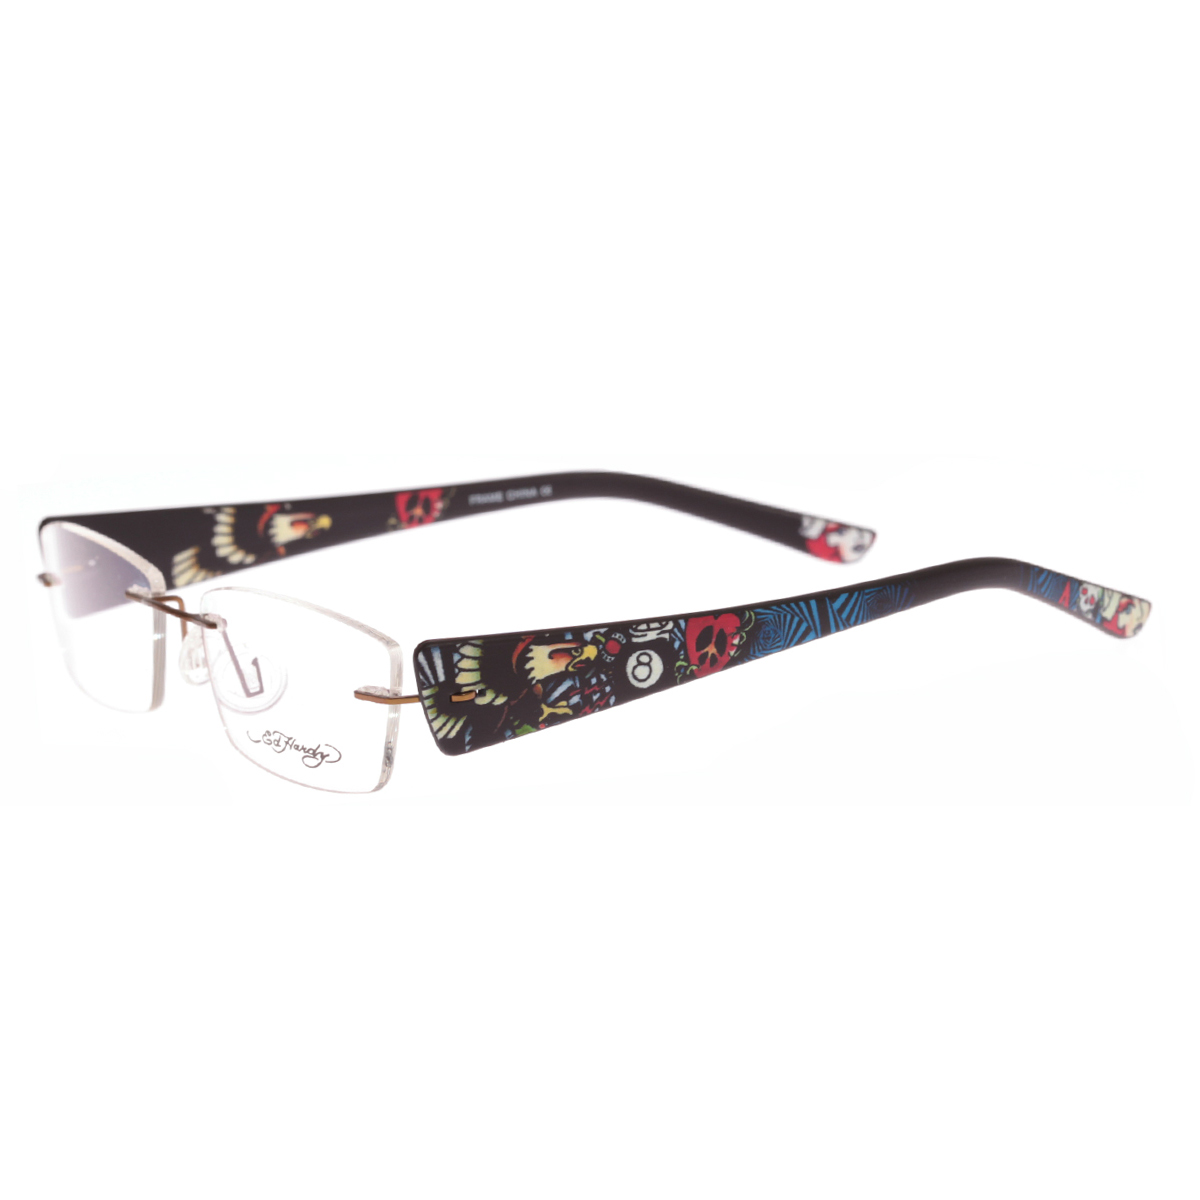 Ed Hardy Lites Eyeglasses Frames : Ed Hardy EHL 815 Lite Designer Eyeglasses eBay